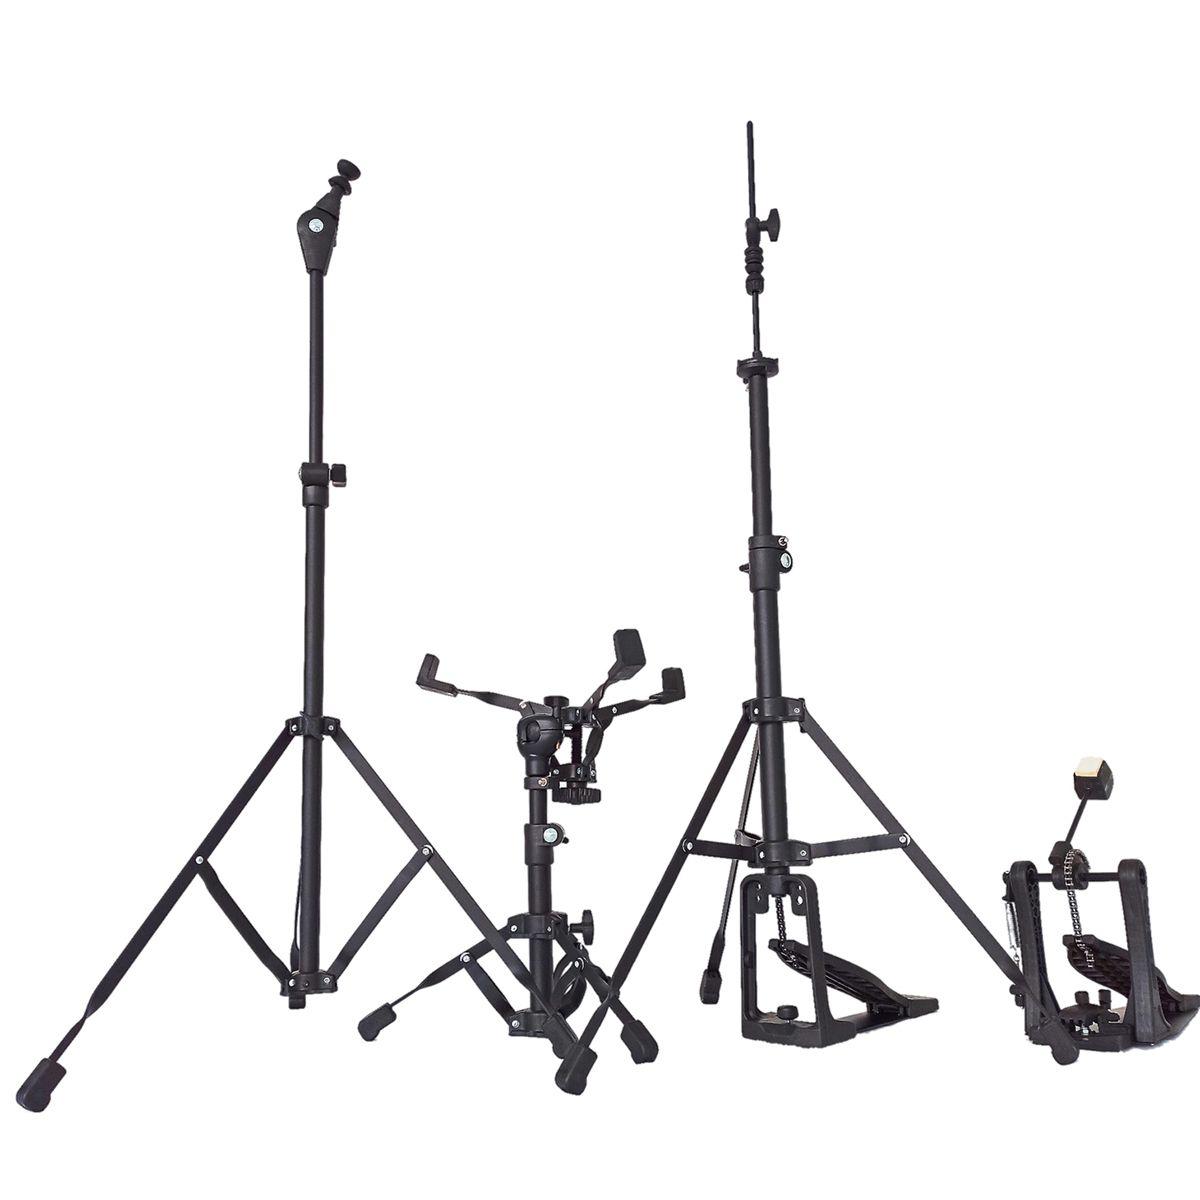 Bateria Acústica RMV Crossroad Scorpion ASPIRE 2 toms 20,10,12,14 cx 14 c/Pratos PBSA20018 Preta